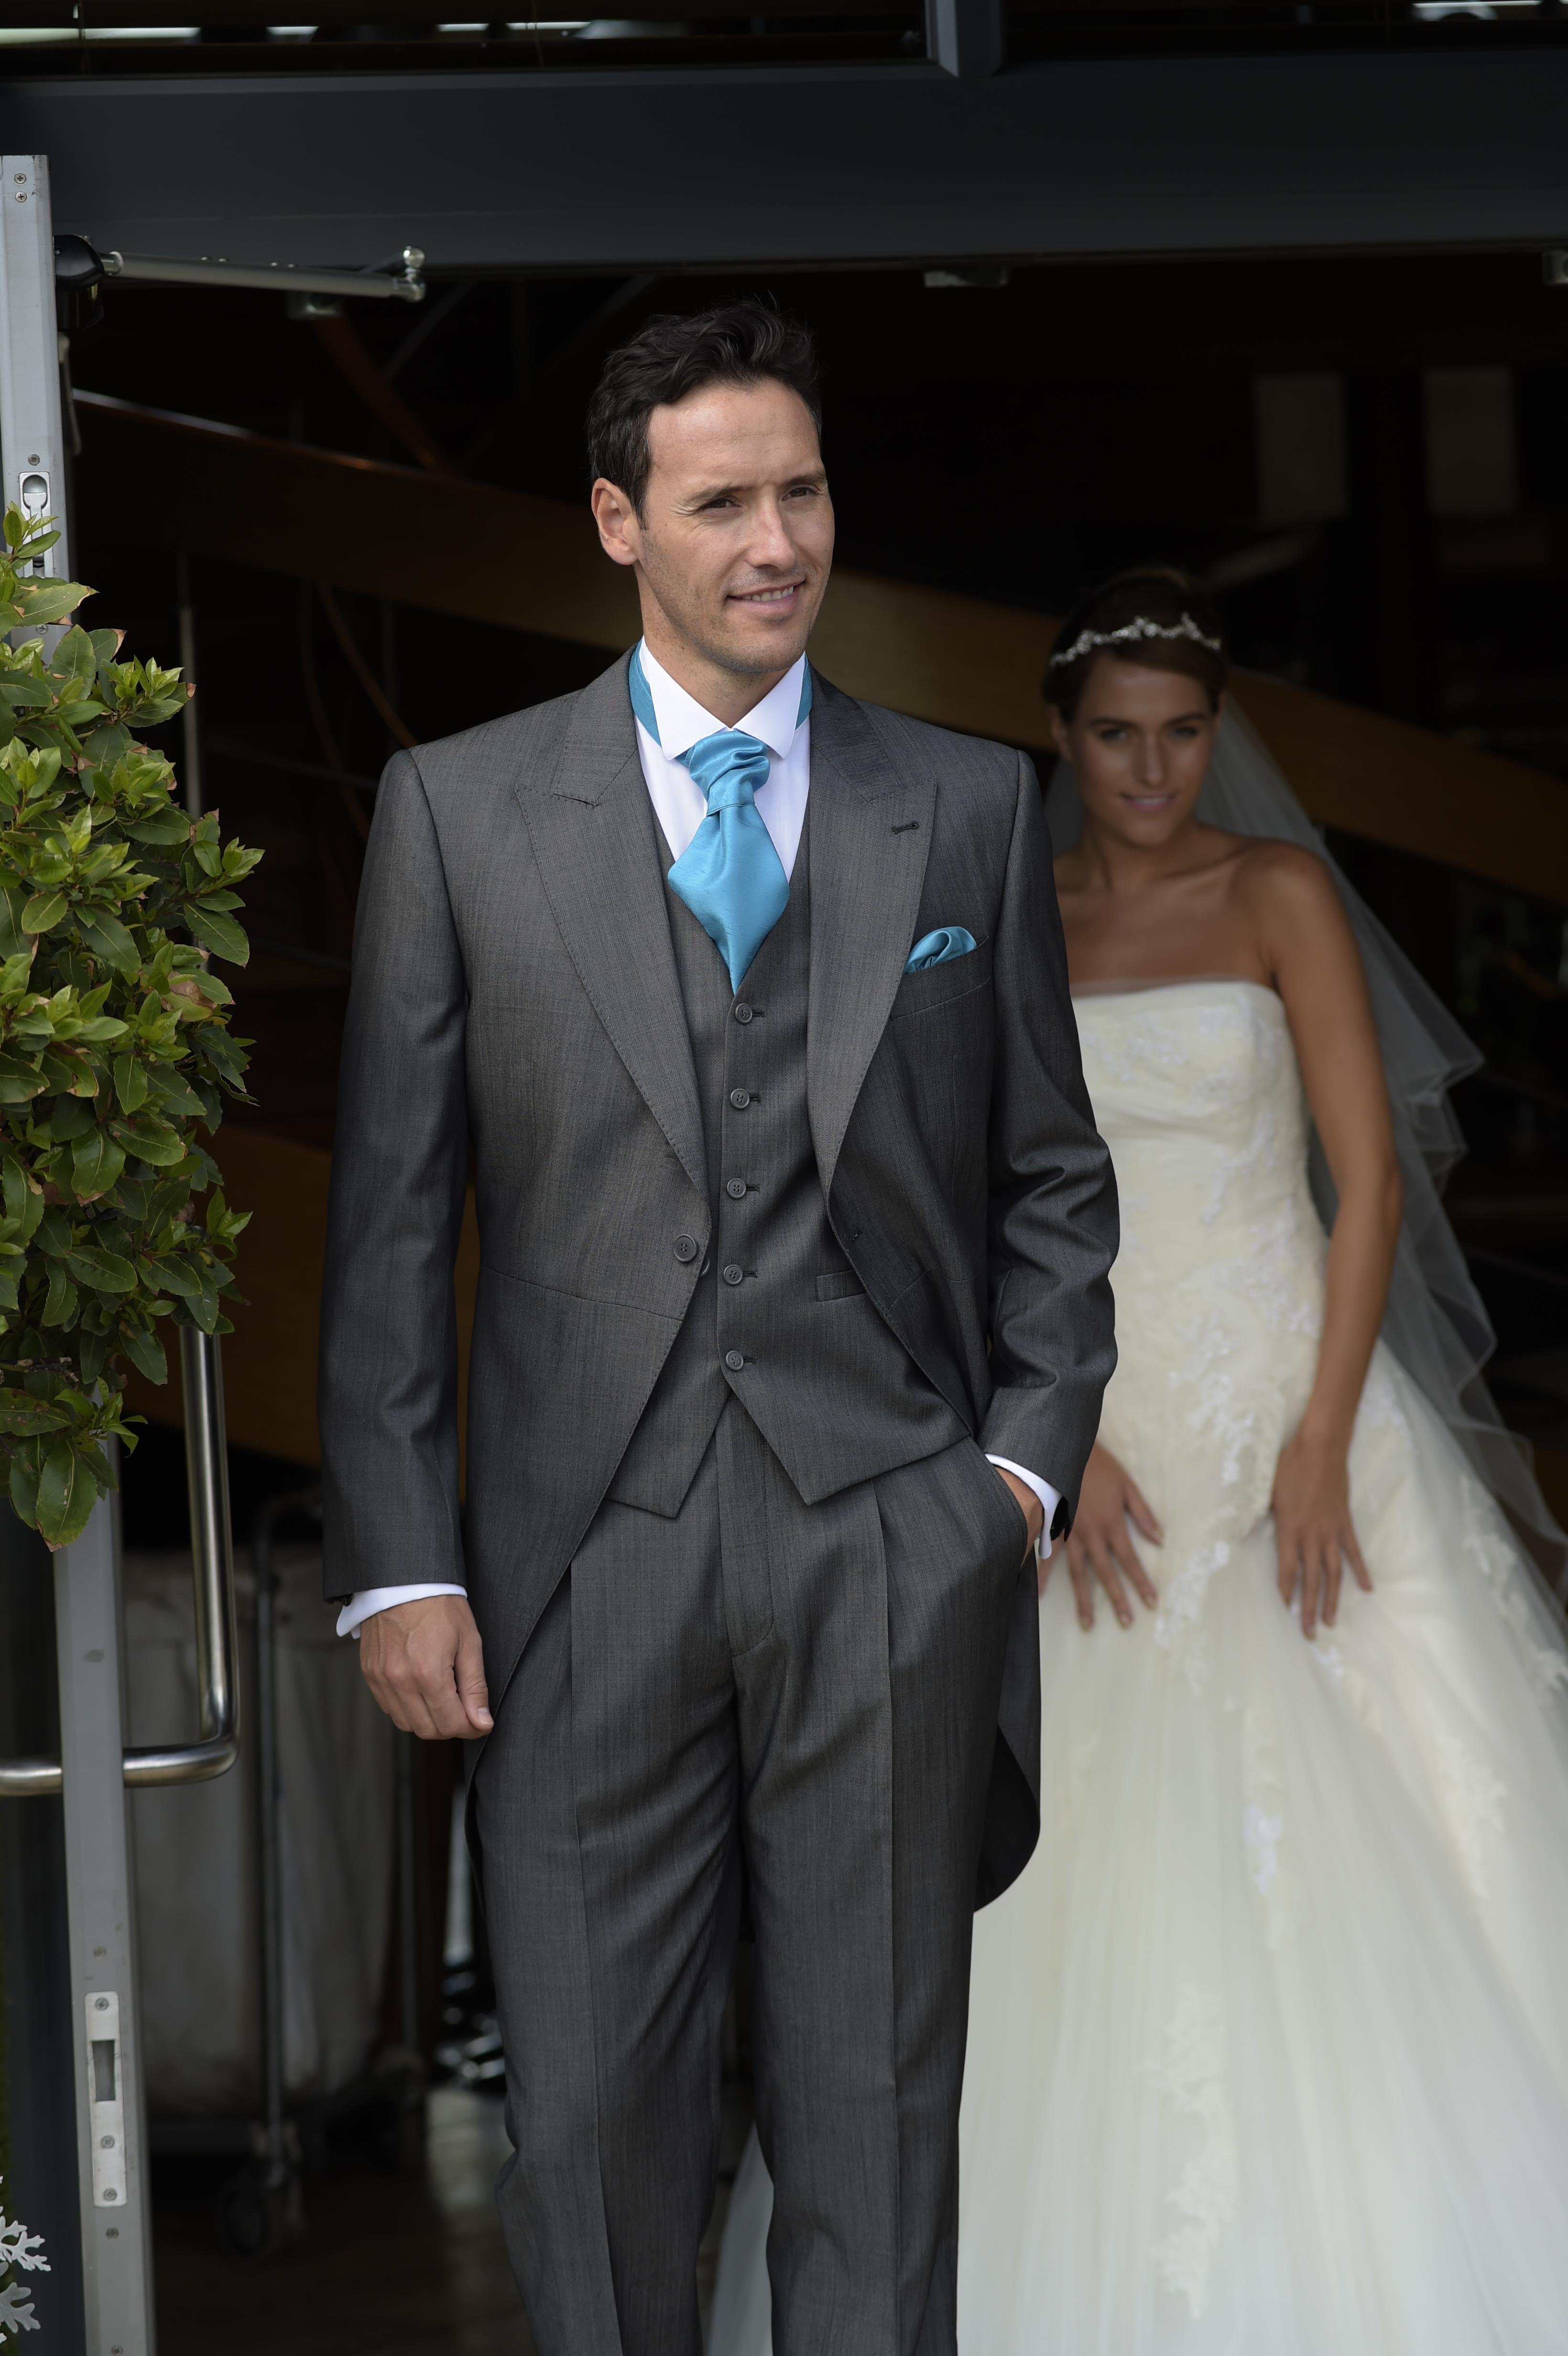 Silk Grey Tailcoat and matching waistcoat